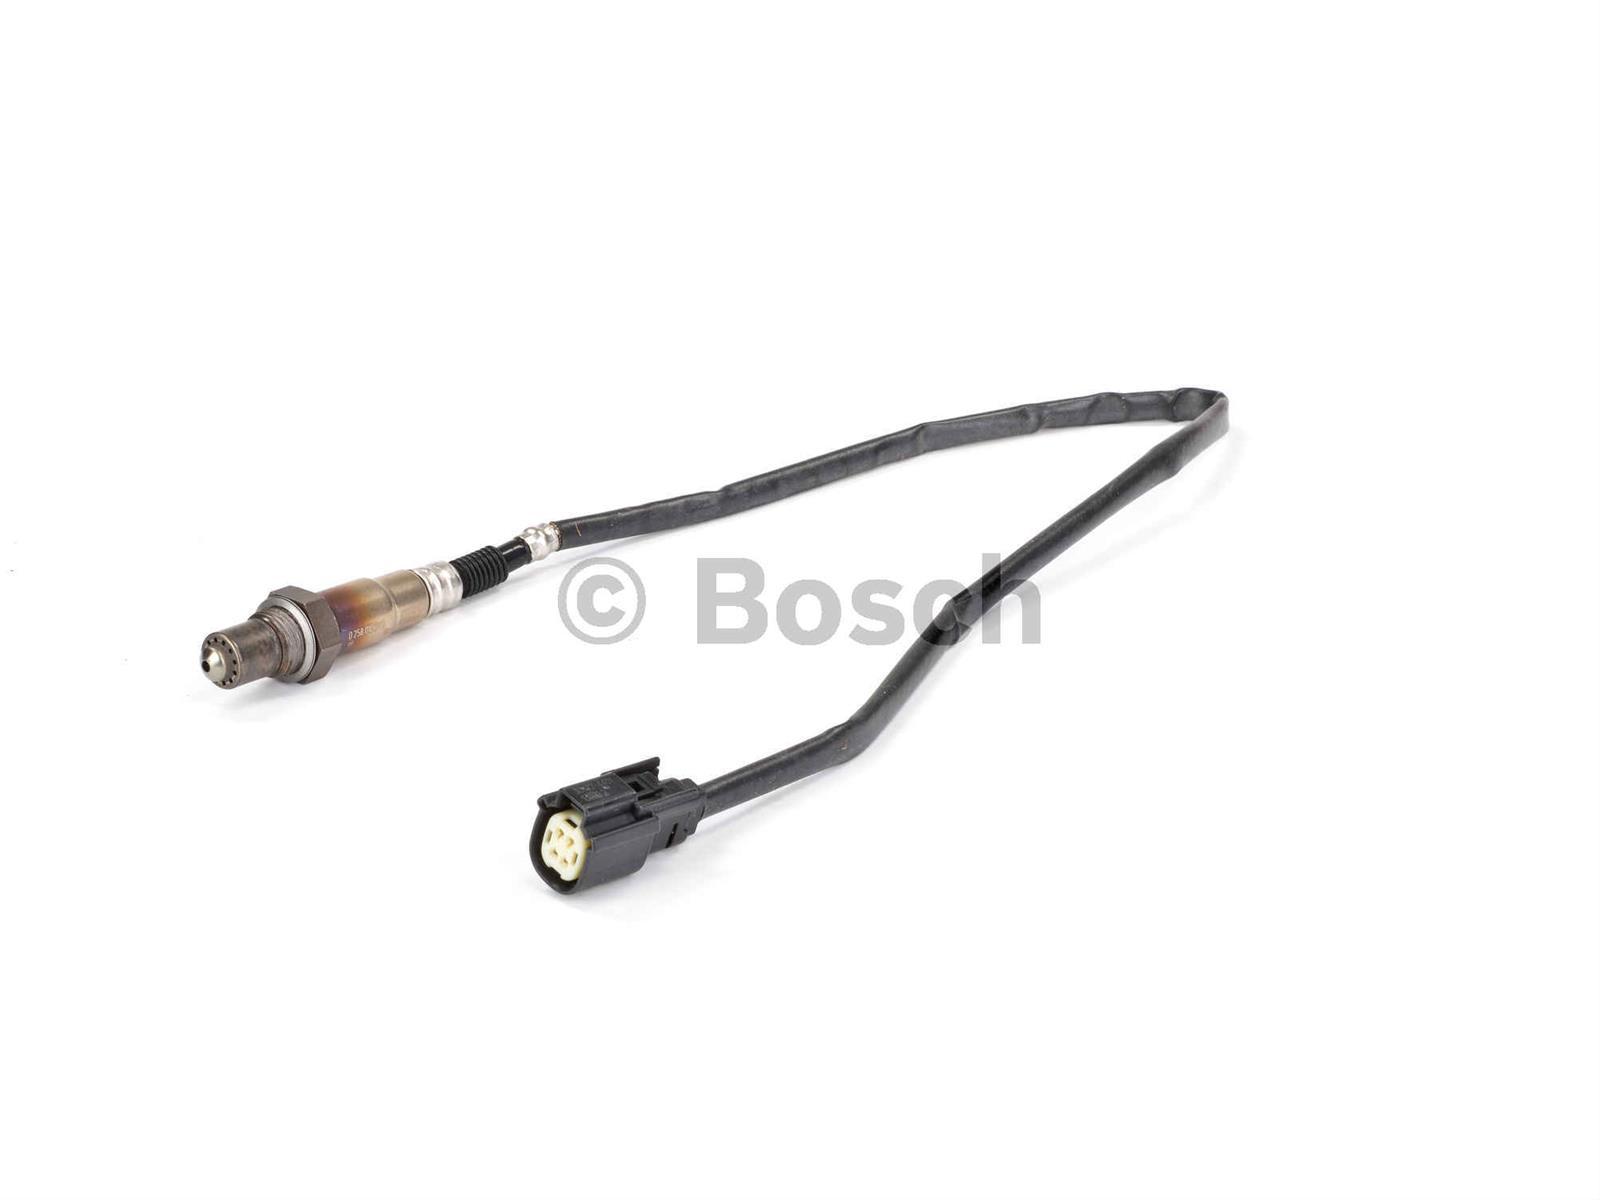 Bosch Automotive Bosch Premium Original Equipment